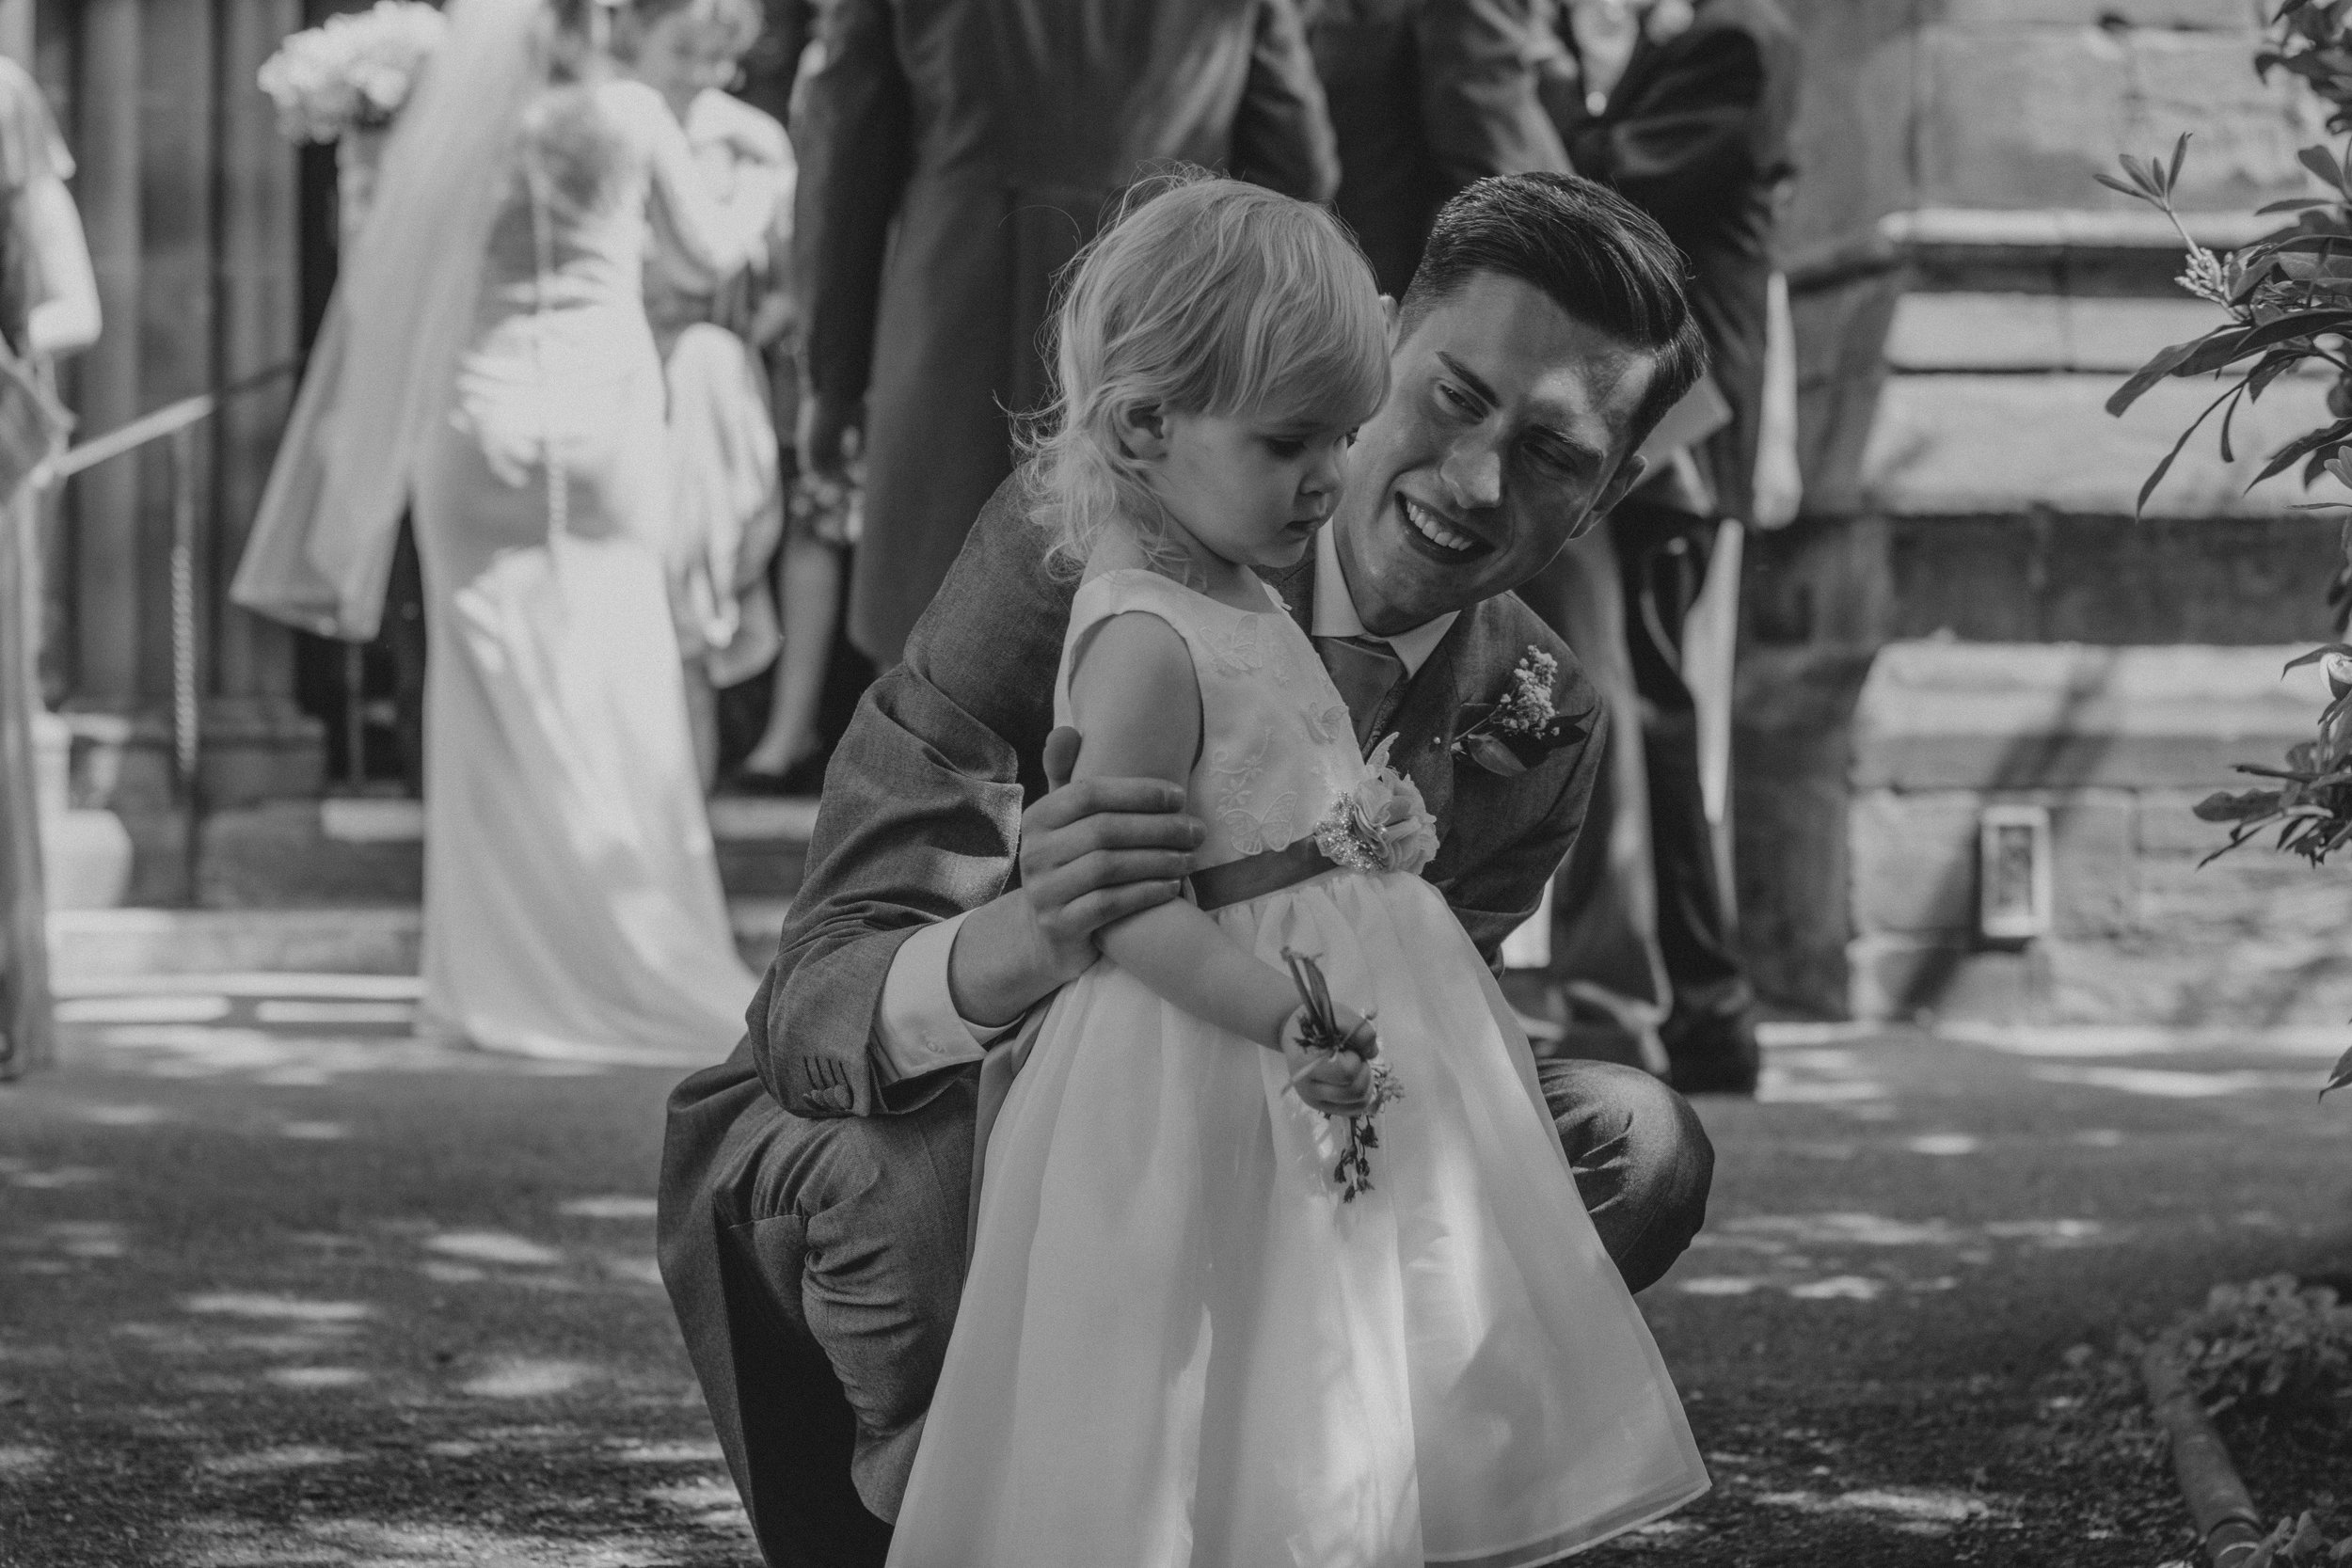 Cheshire wedding Photographer wedding photographer engagement photographer carlisle wedding photographer edinburgh wedding photographer Paris wedding photographer (1 of 1)-4.jpg